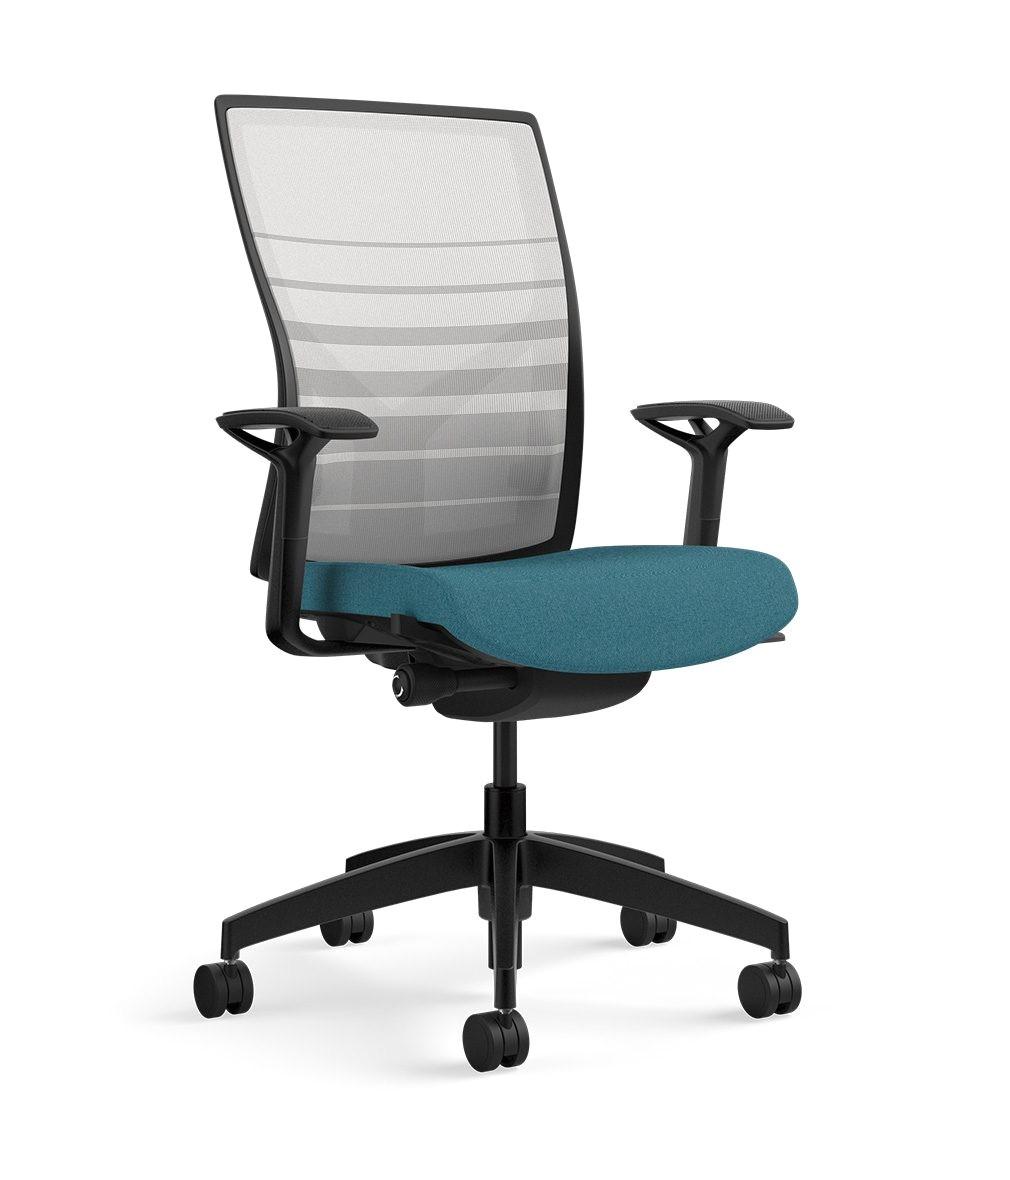 Torsa Chair torsa Task Work Chairs Seating Sitonit Seating